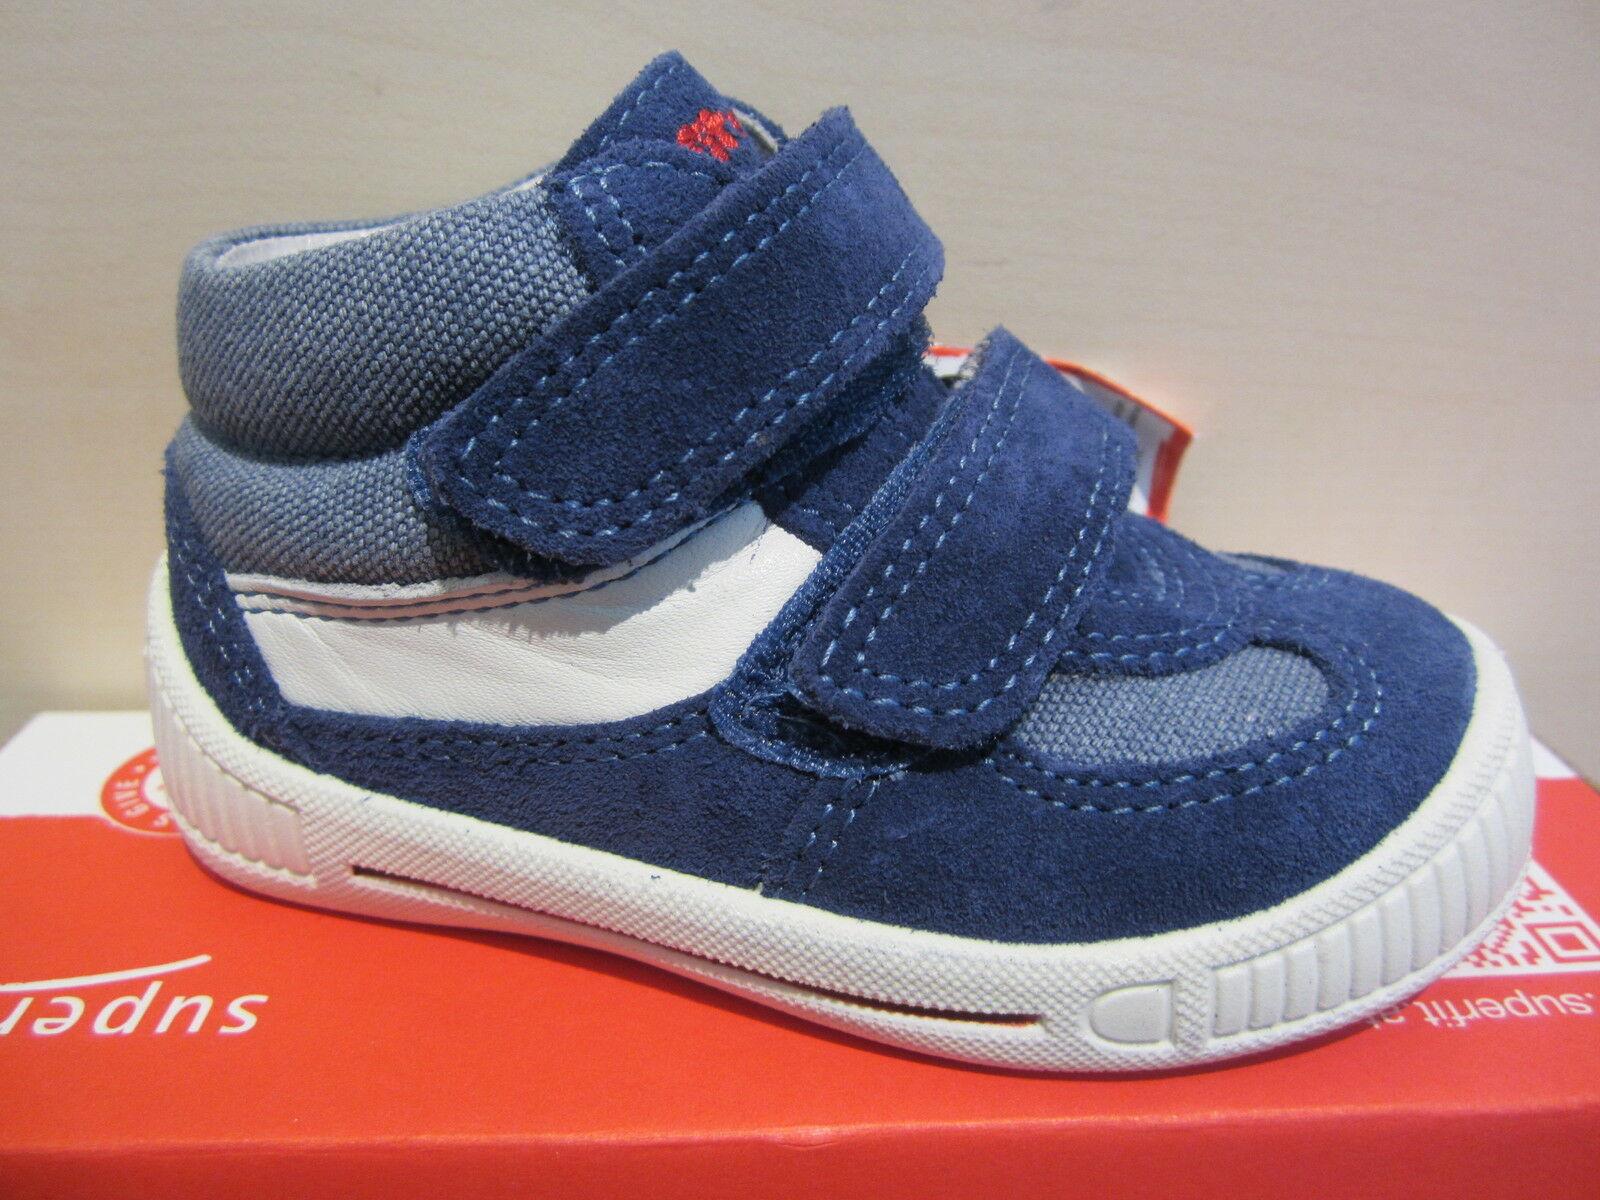 Superfit Lauflern-Stiefel blau weiss KV Lederfußbett Leder Neu